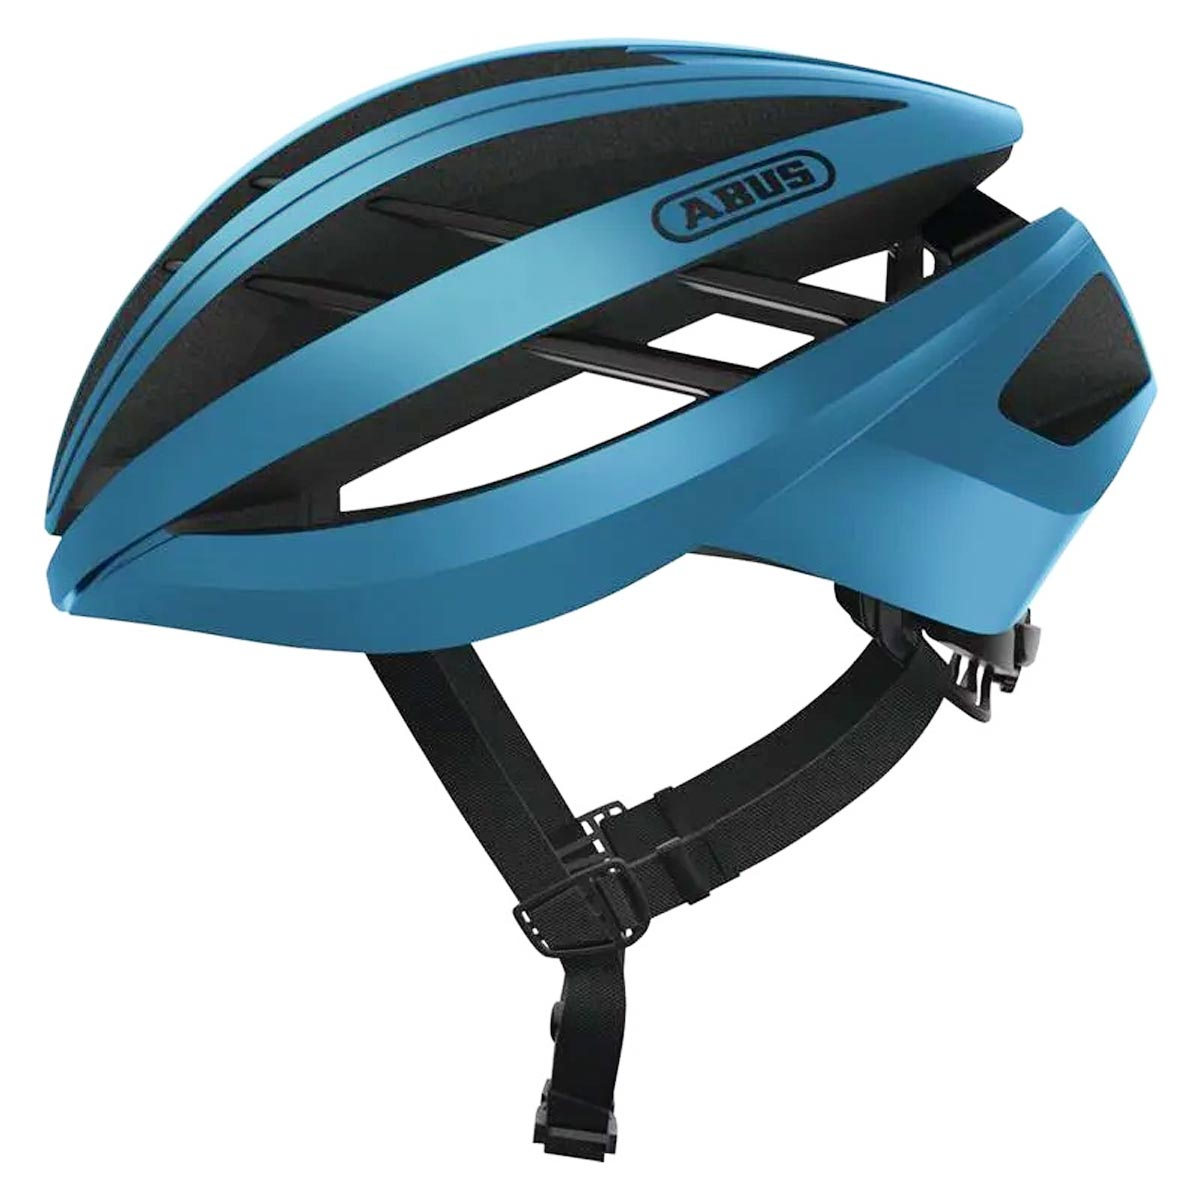 Capacete Abus Aventor Azul Fosco Ciclismo Bike